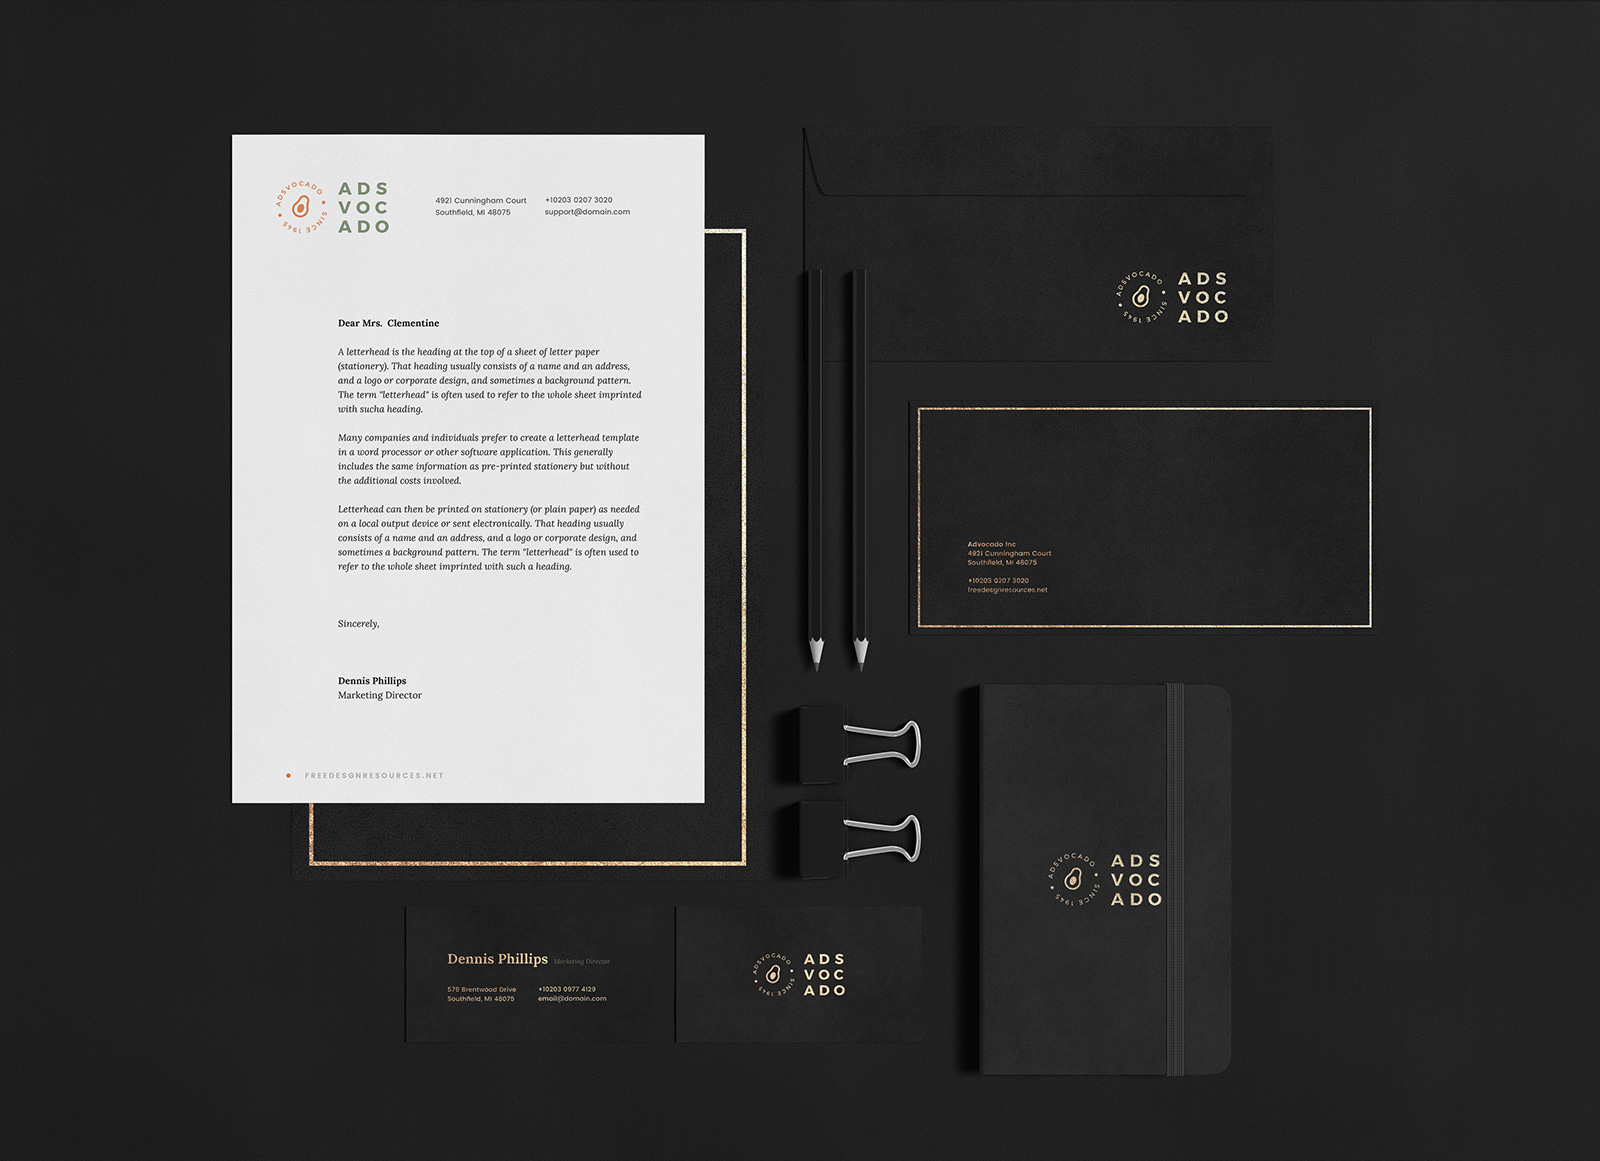 Free-Premium-Corporate-Identity-Mockup-PSD-2